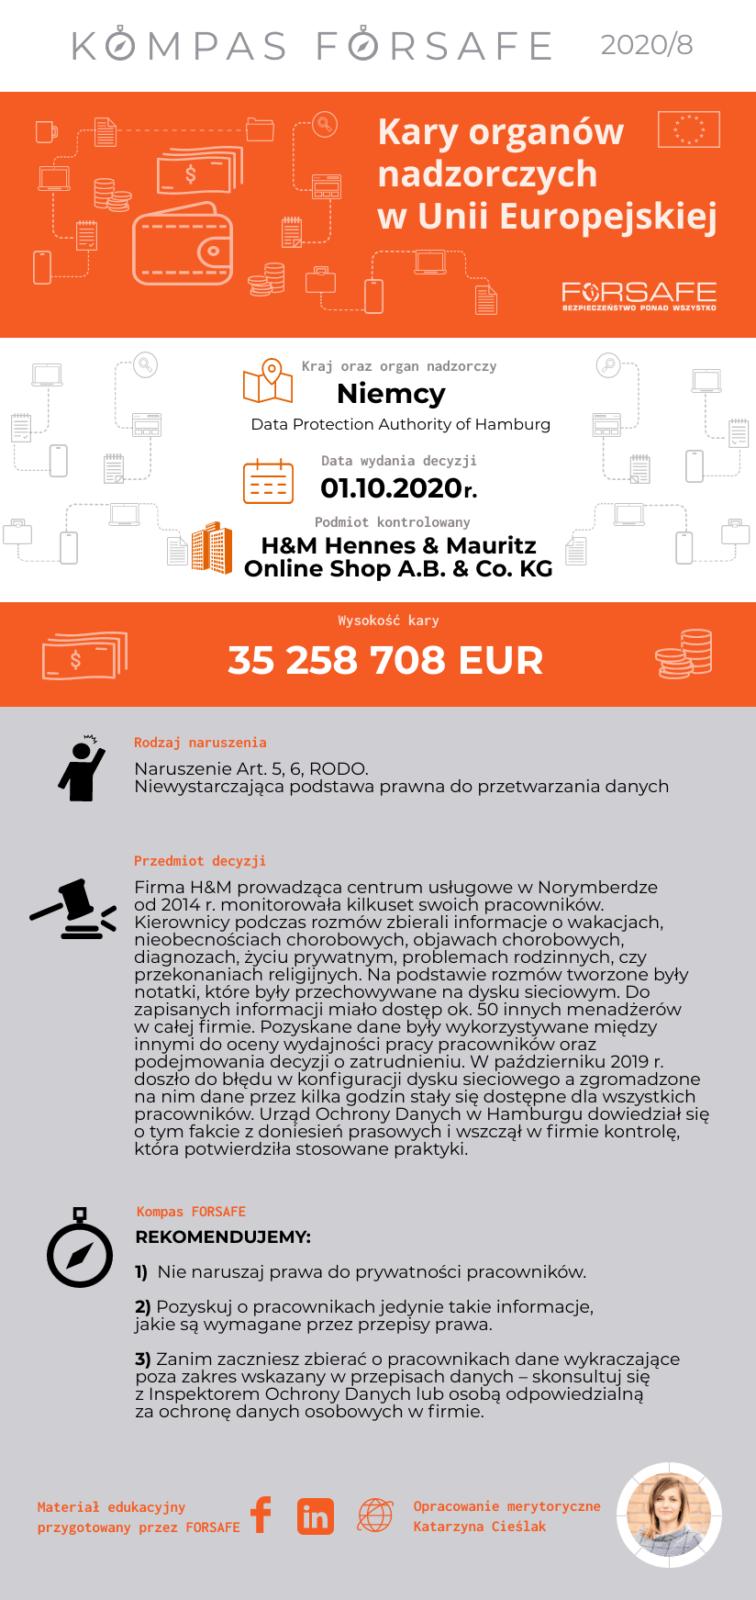 kompas forsafe 8 KOMPAS FORSAFE EU 2020/8 - Kara dla Hennes & Mauritz